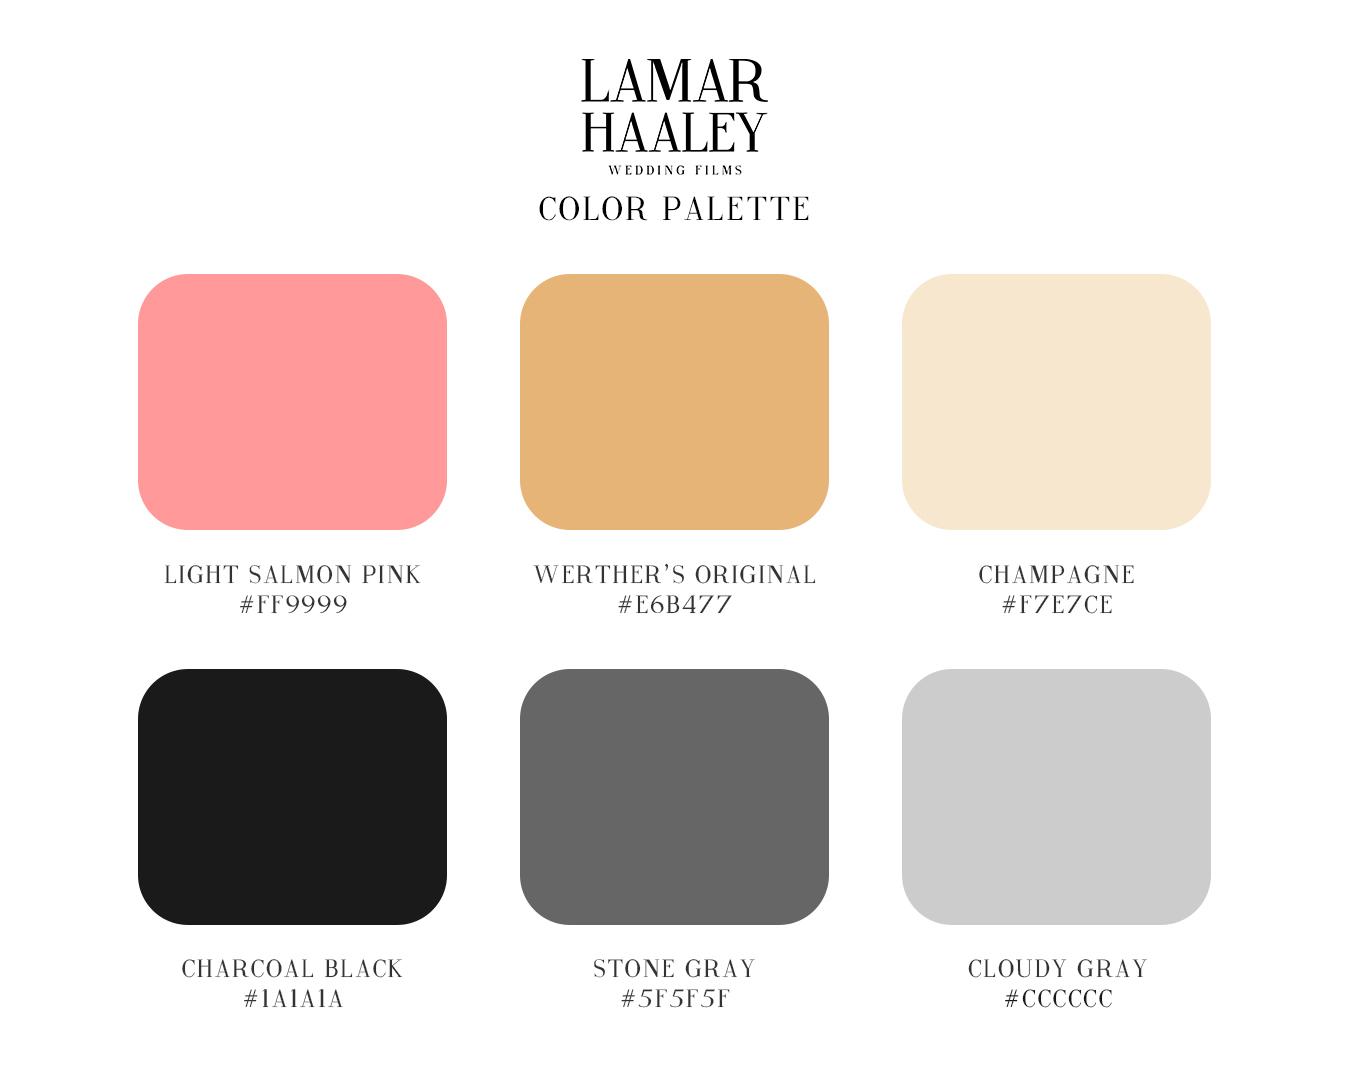 Lamar Haaley Wedding Films - Color Palette.jpg